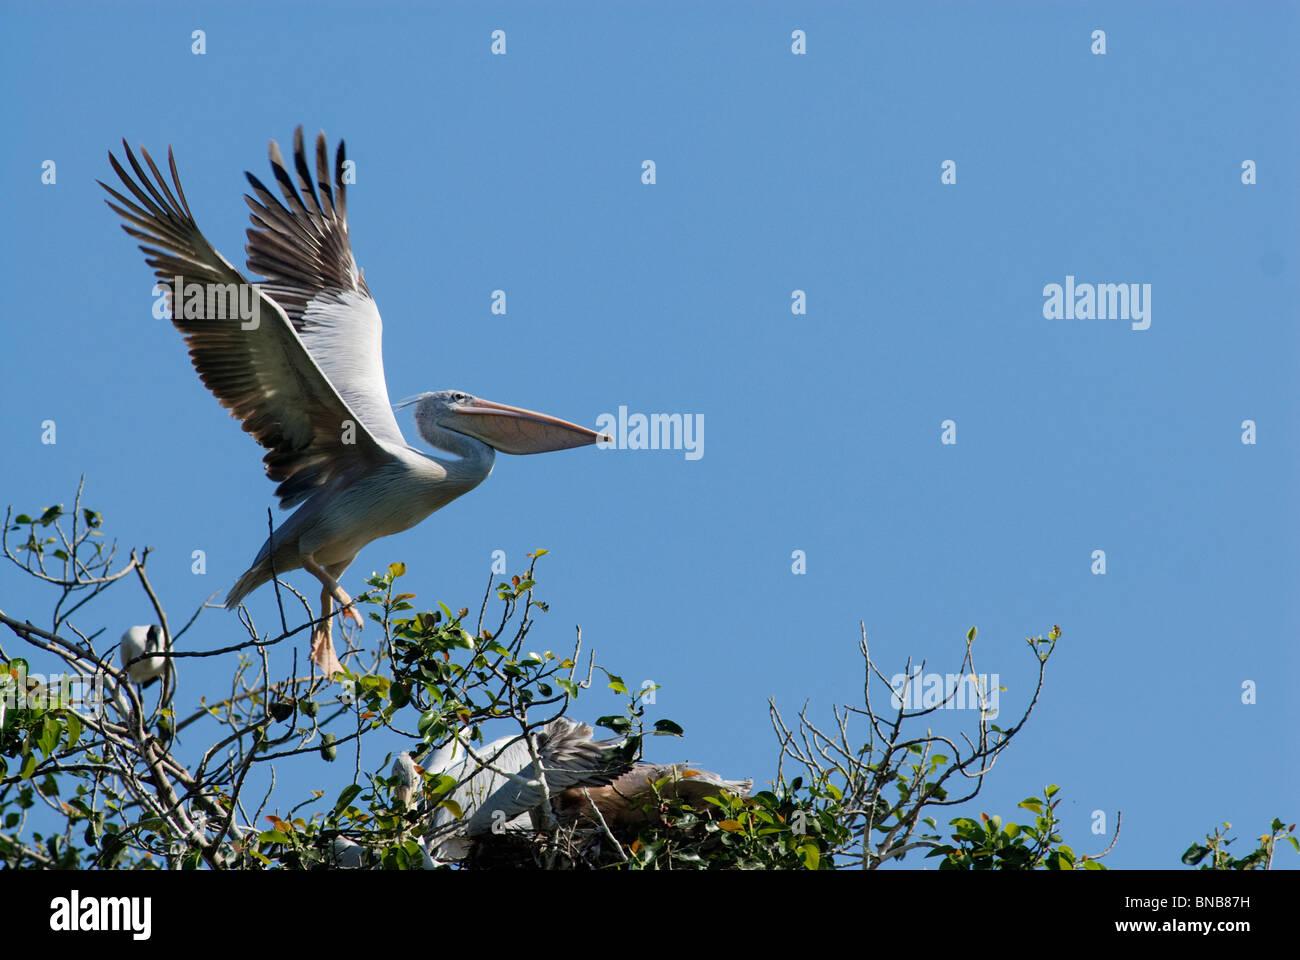 Great White Pelican landing on tree. Kwazulu-Natal, South Africa - Stock Image